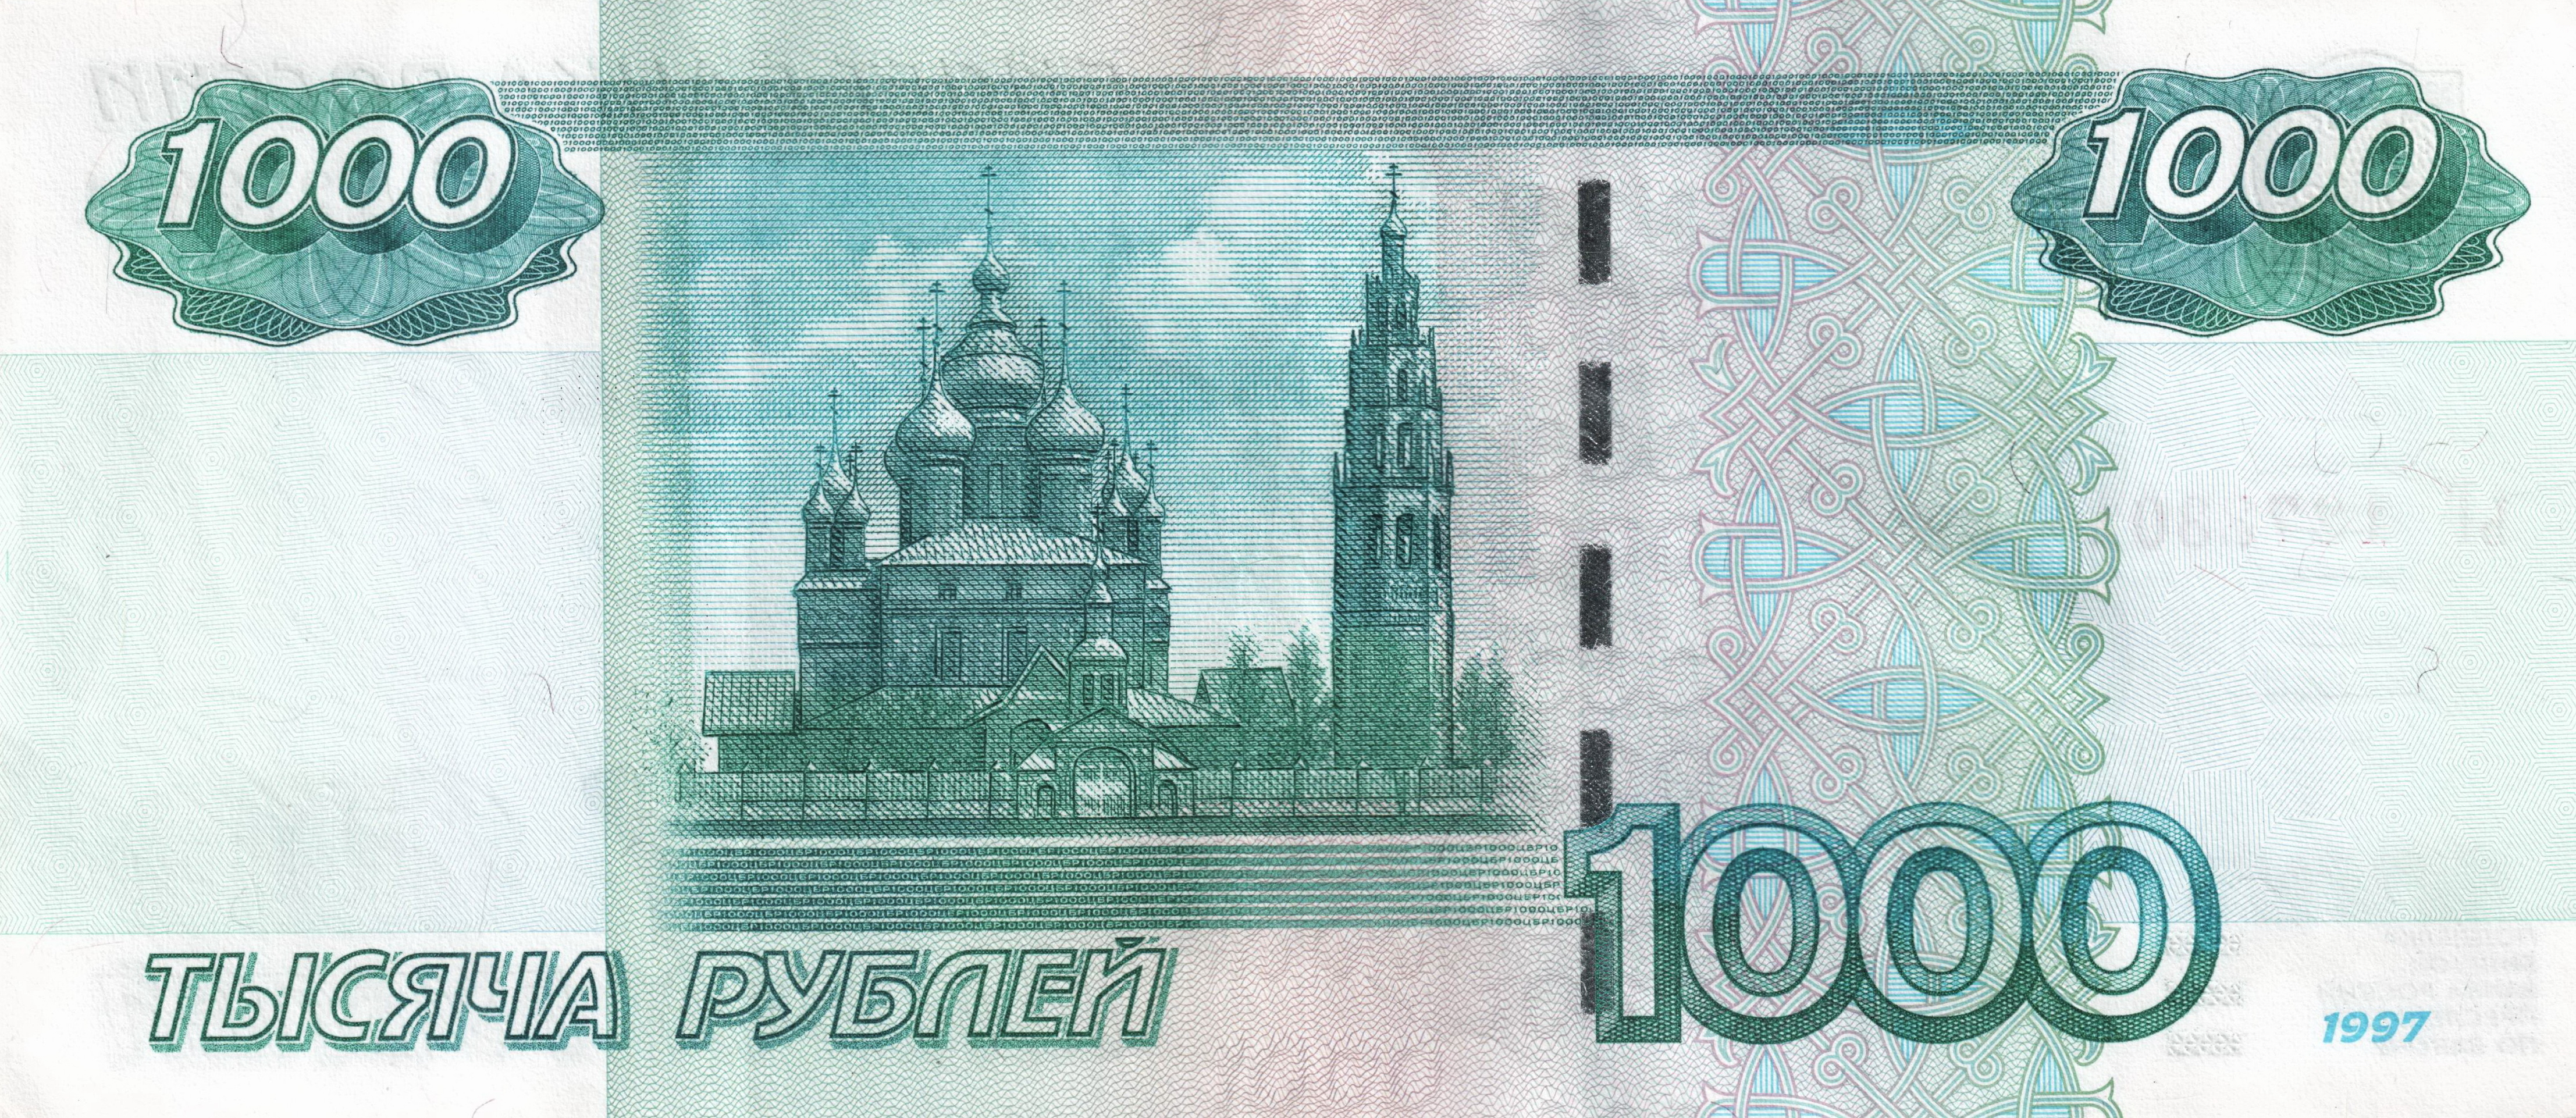 Изображение - Кто изображен на 1000 рублевой купюре Banknote_1000_rubles_2004_back